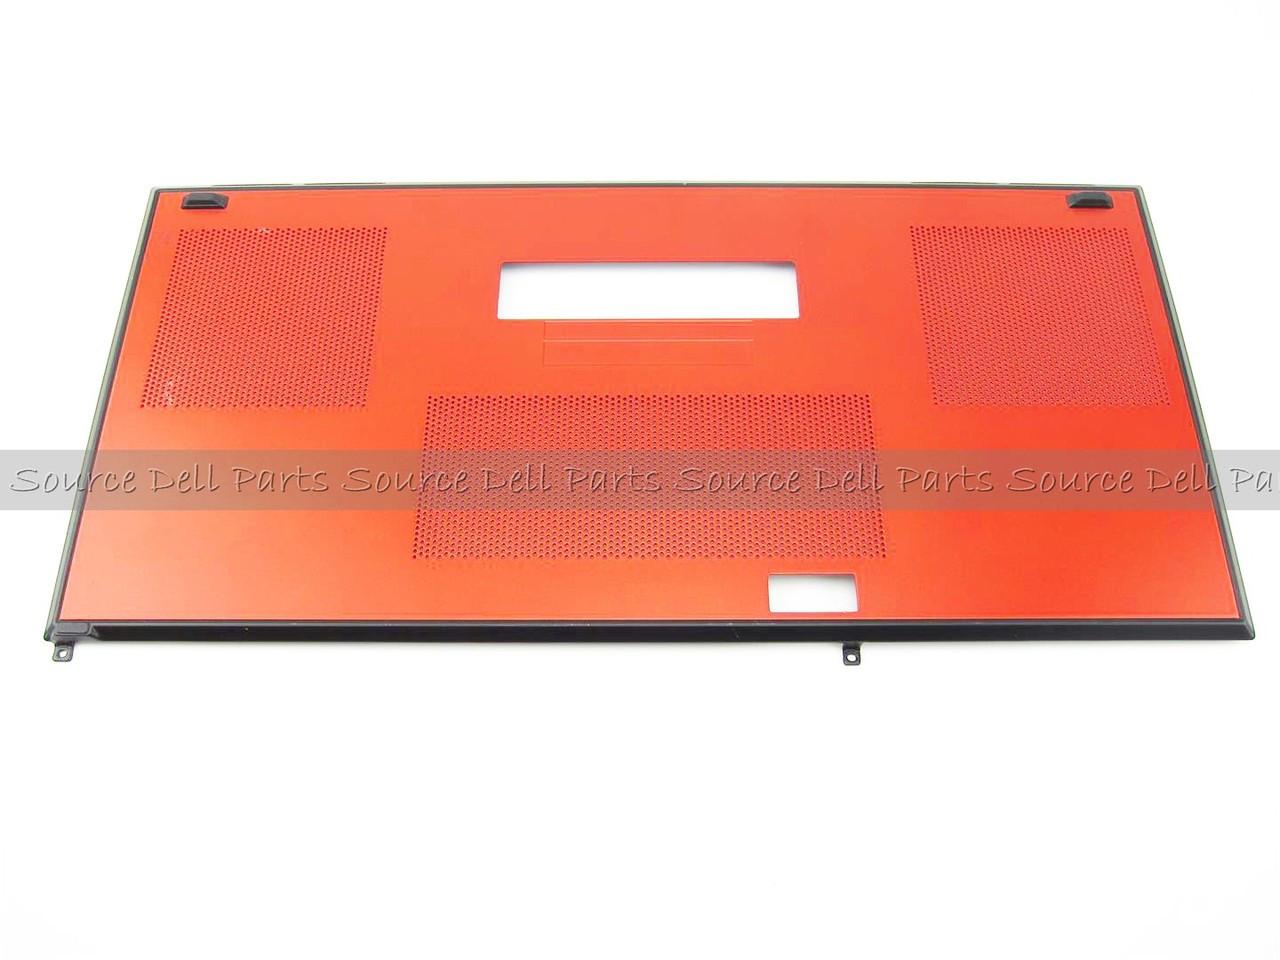 Dell Precision M6500 Covet Orange Bottom Access Panel Door - XR3YF